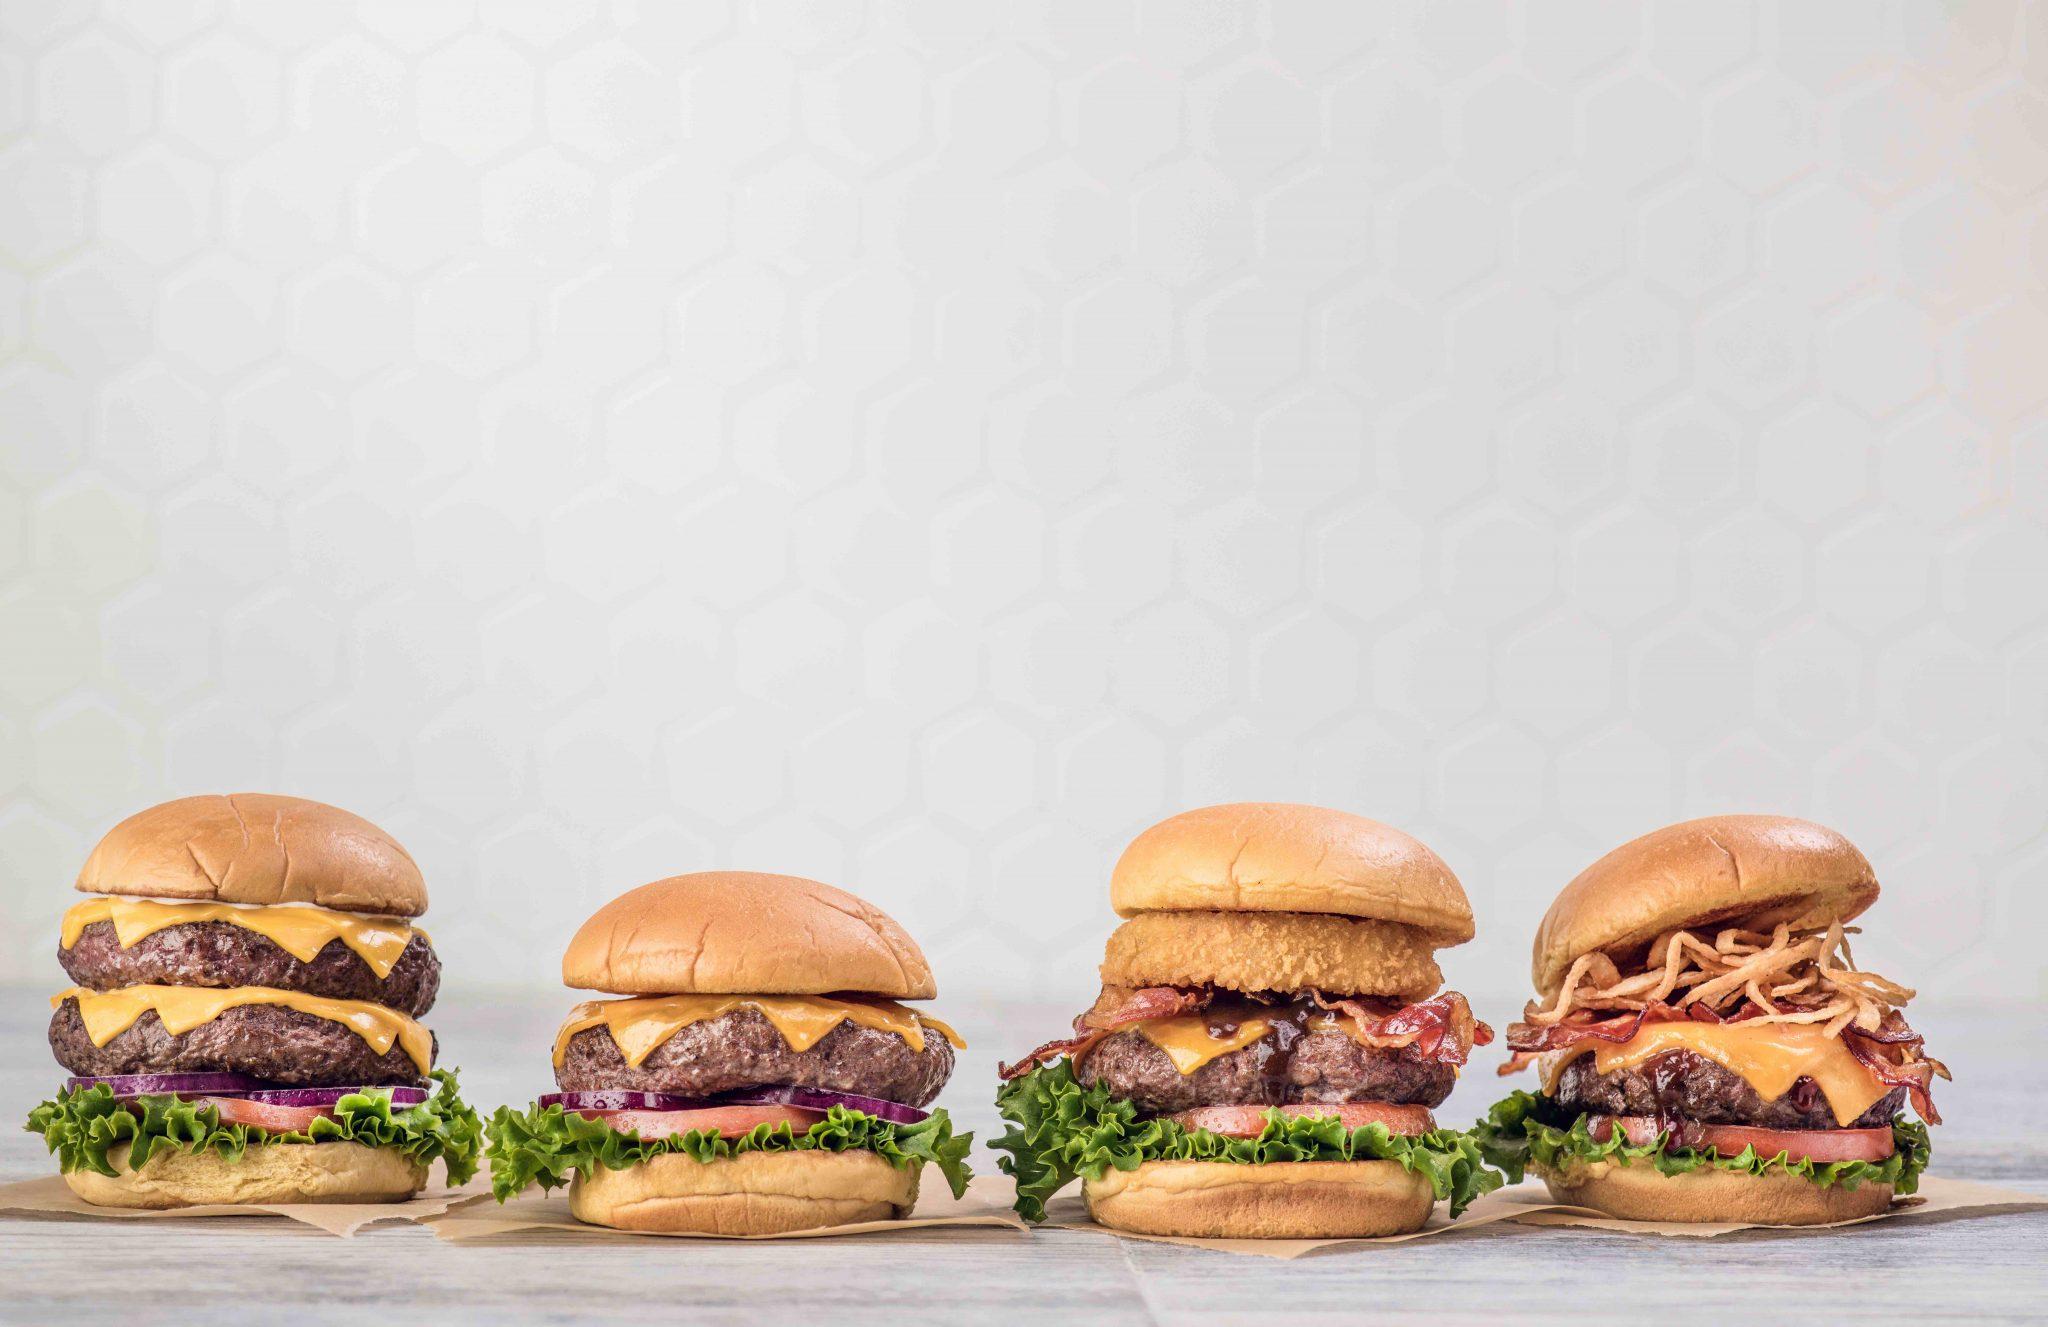 Legendary Steak Burgers